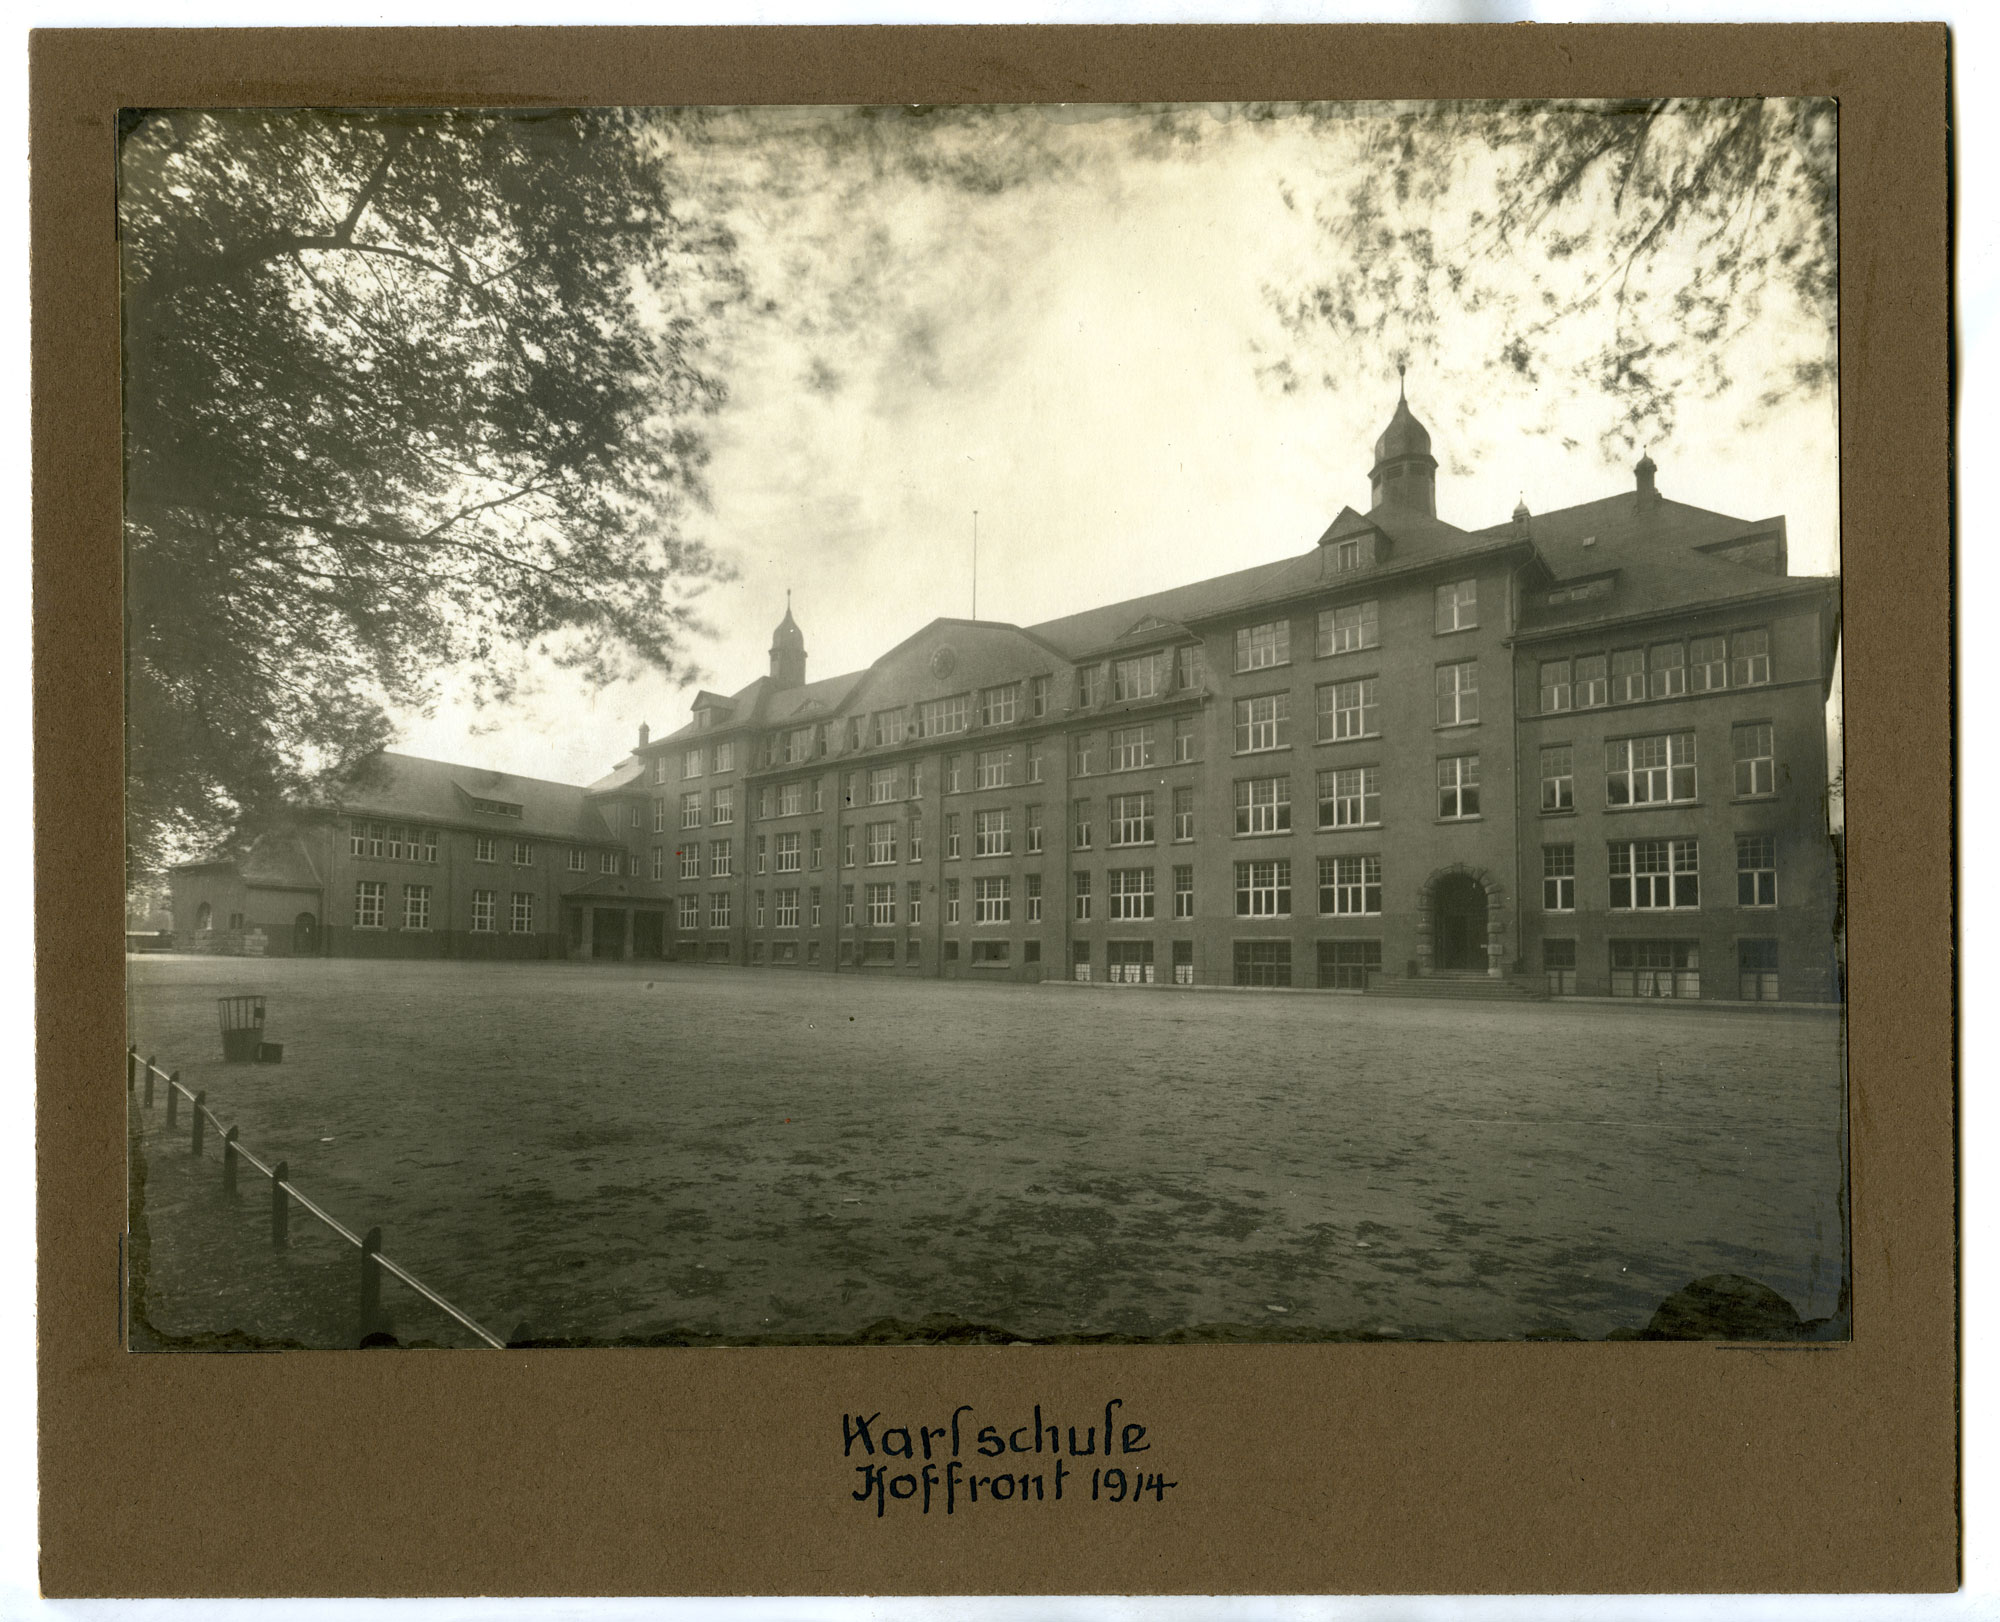 Karlschule Rueckansicht 1914